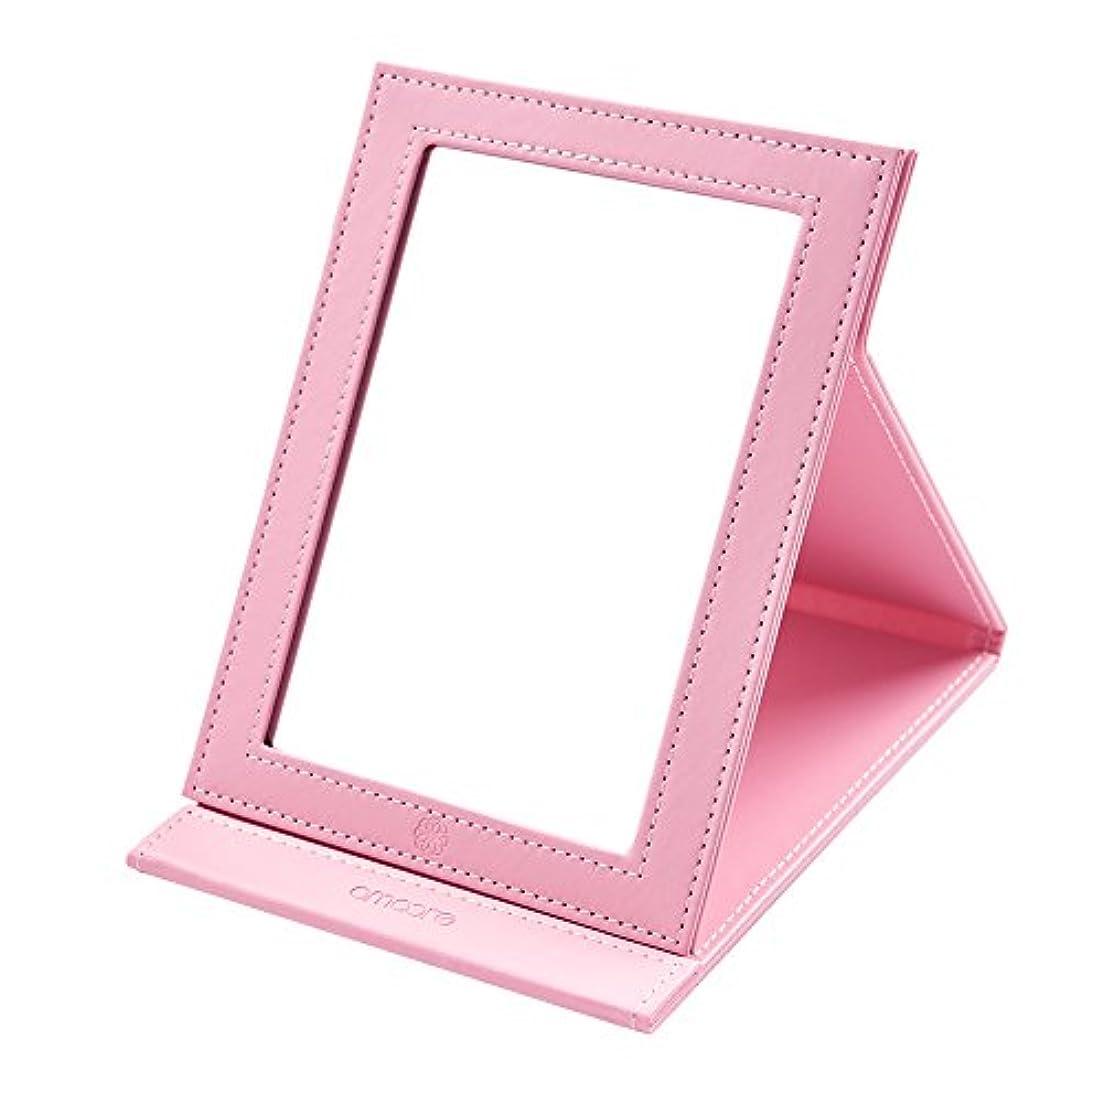 amoore 化粧鏡 卓上スタンドミラー 折りたたみミラー 角度調整 上質PUレザー使用 (ビッグ, ピンク)